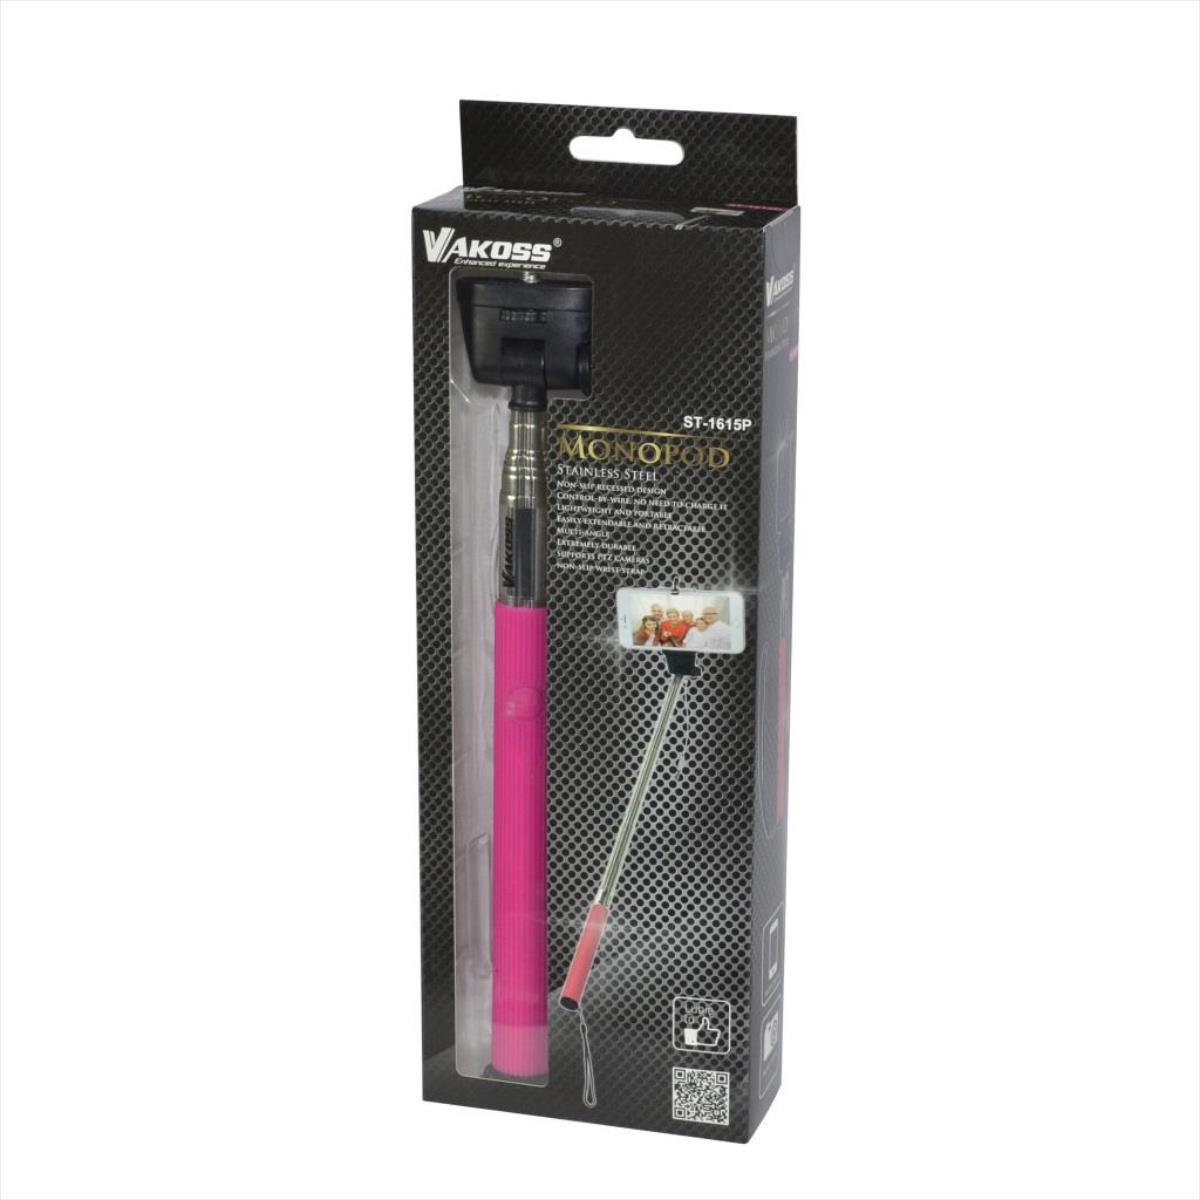 VAKOSS SELFIE Stick with cable minijack 3,5mm  ST-1615P pink Selfy Stick